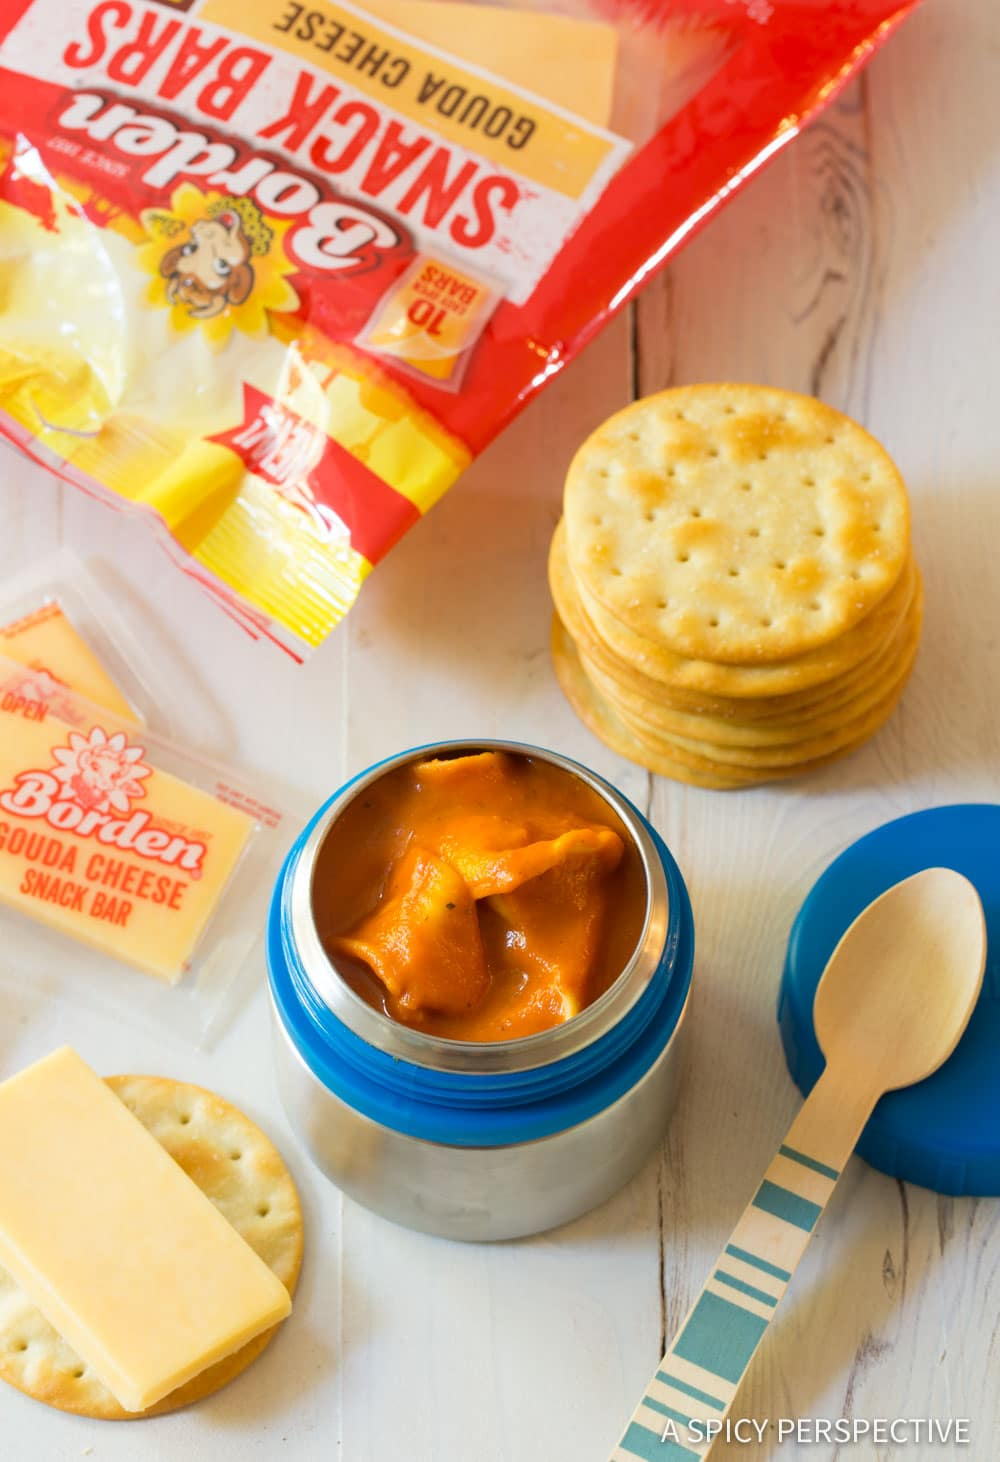 Lunchbox Creamy Tomato Tortellini Soup Recipe #ASpicyPerspective